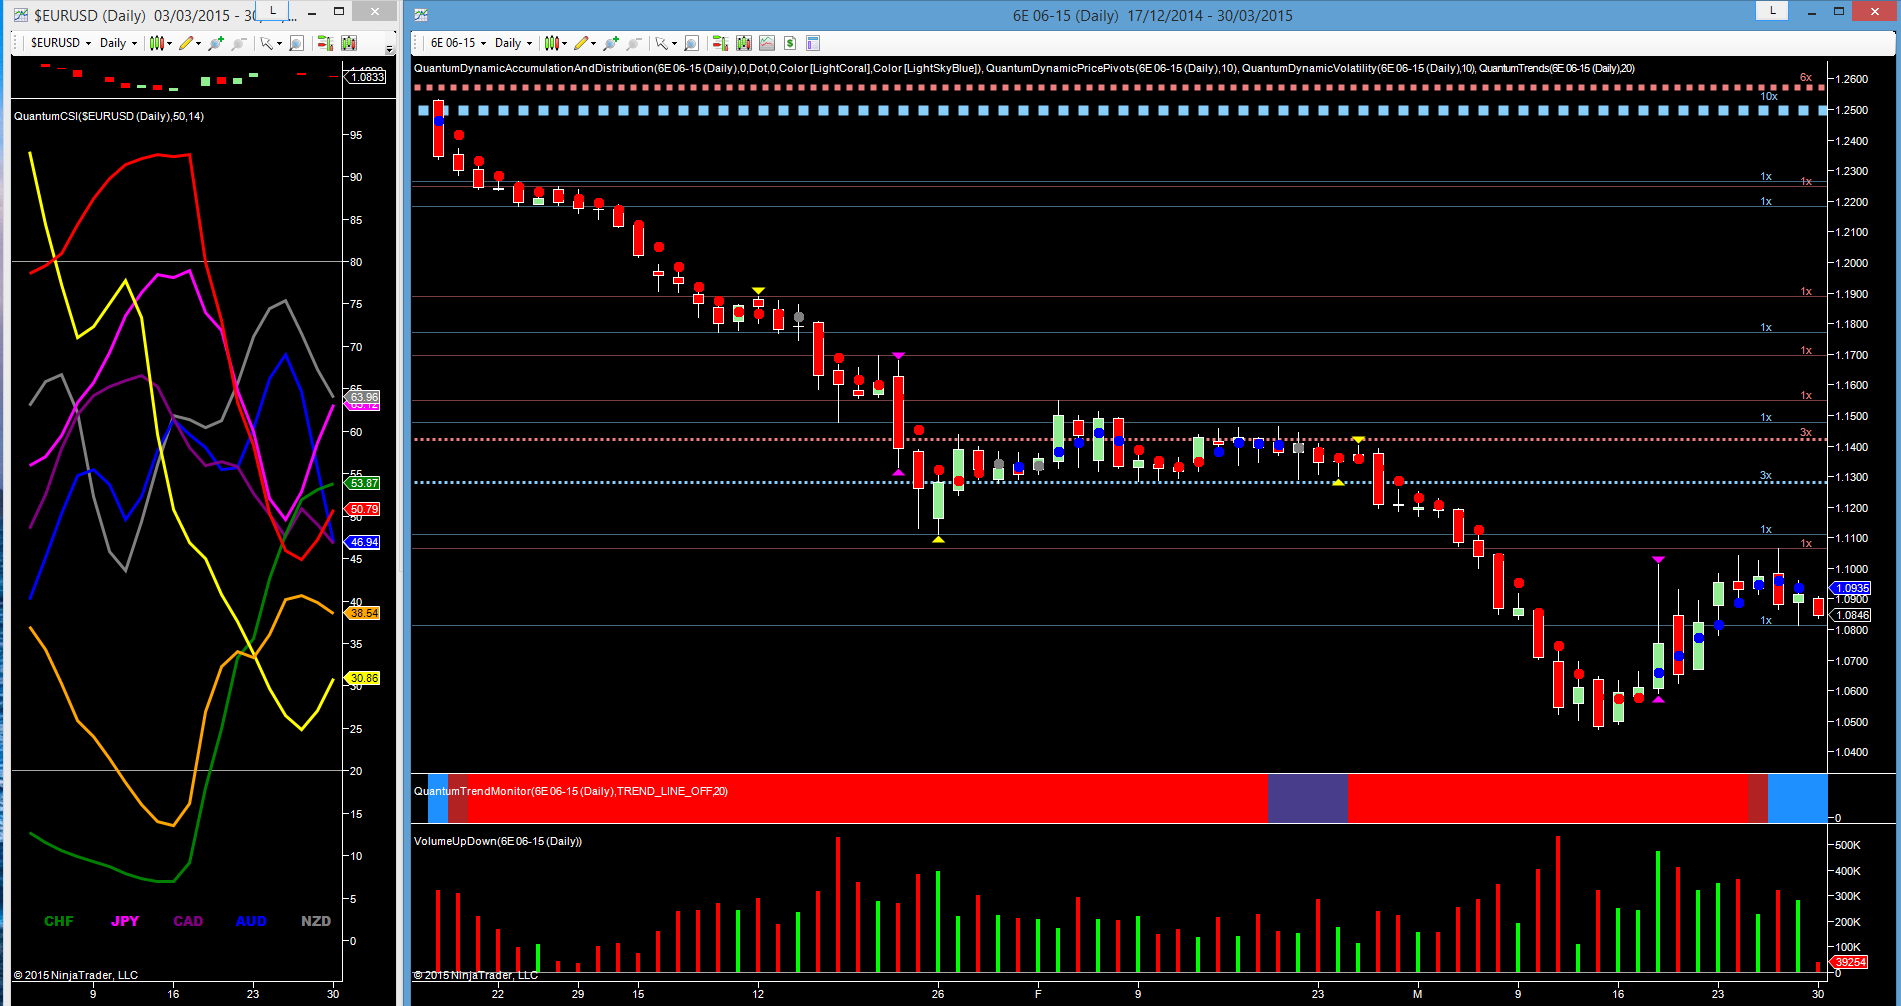 6E 06-15 - daily chart